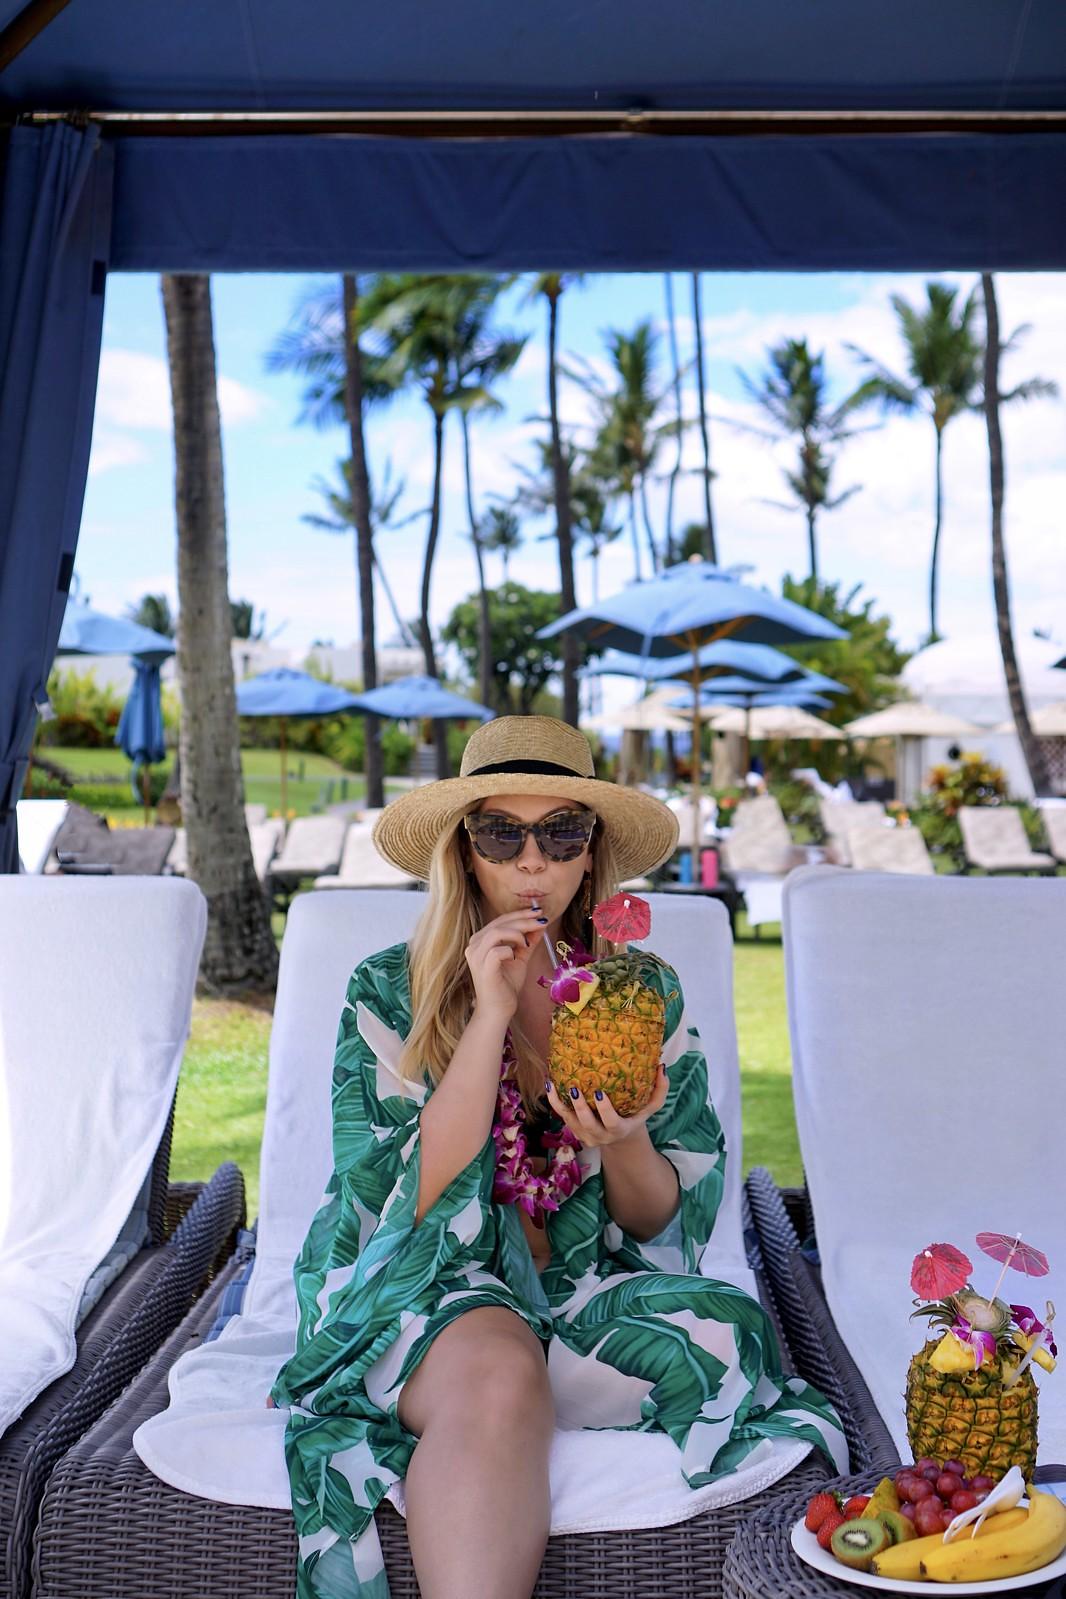 Fairmont Hotel Maui Hawaii   Cabana at Pool   Pineapple Drink   Palm Print Kimono